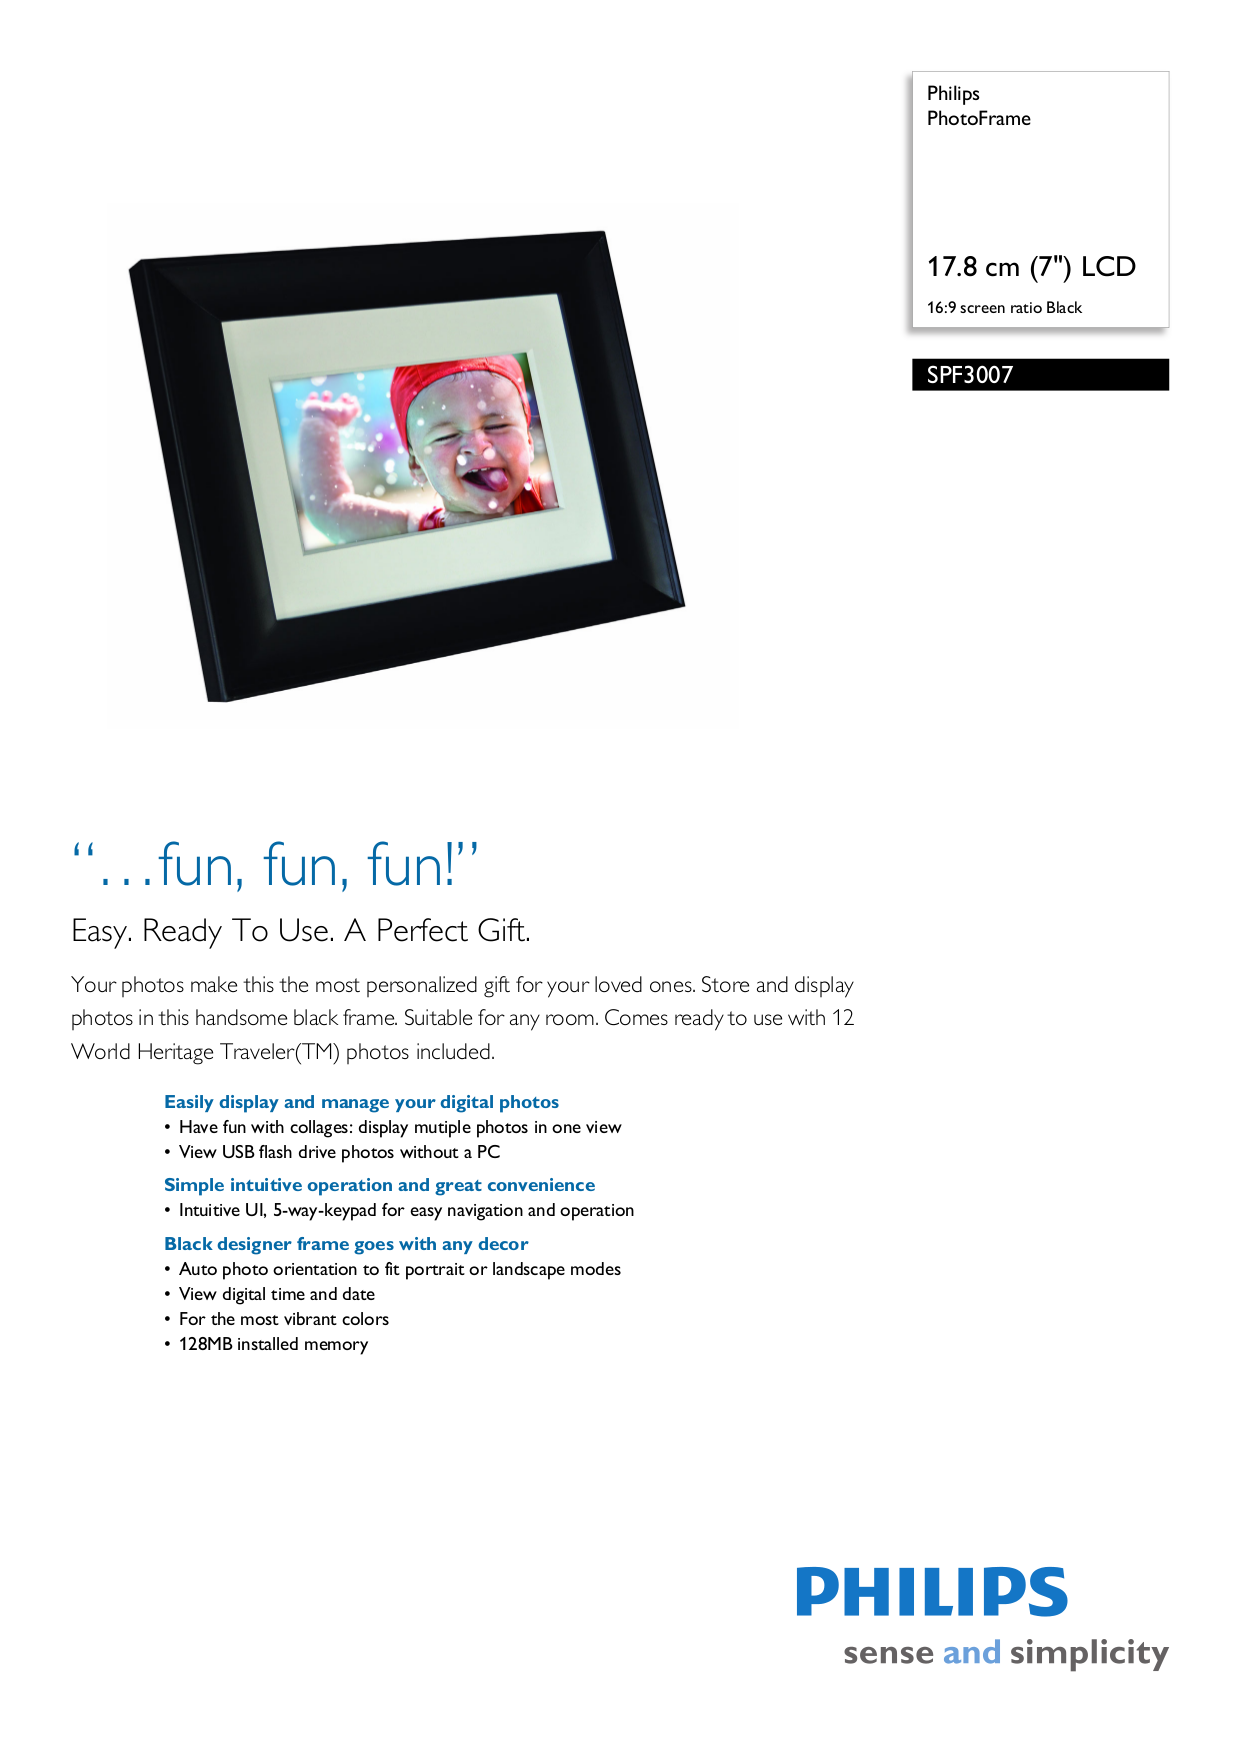 philips digital photo frame manual frame design   reviews